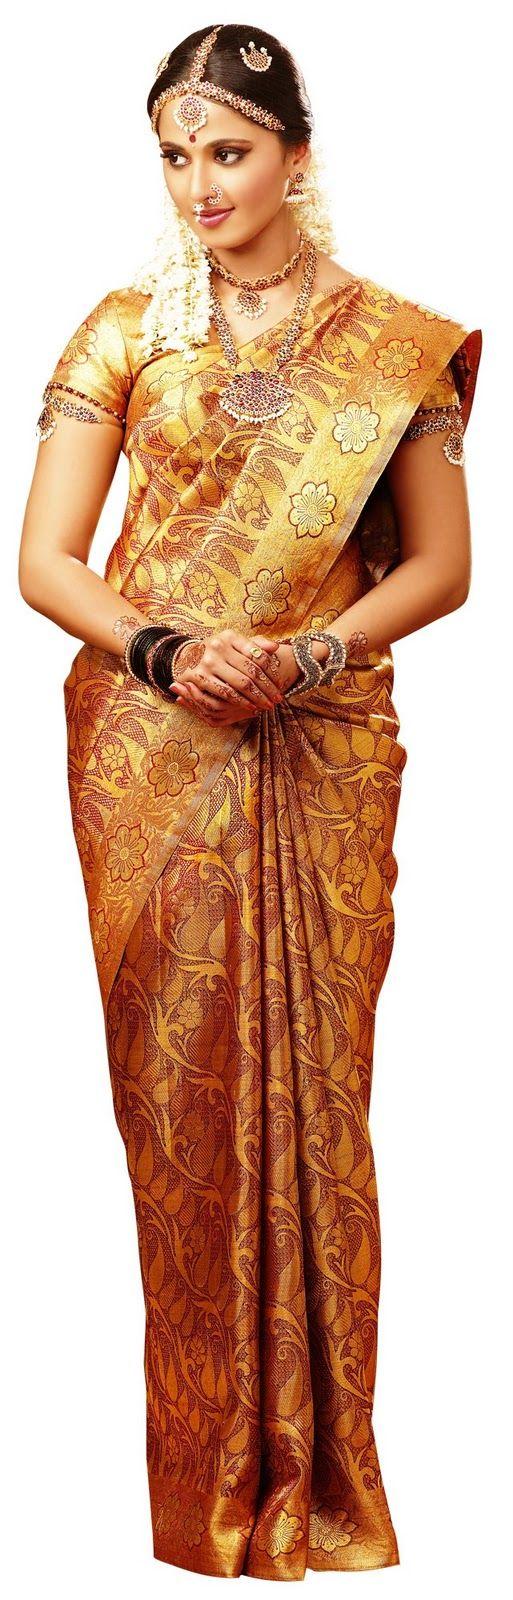 anushka-shetty-actress-saree.jpg 513×1,600 pixels